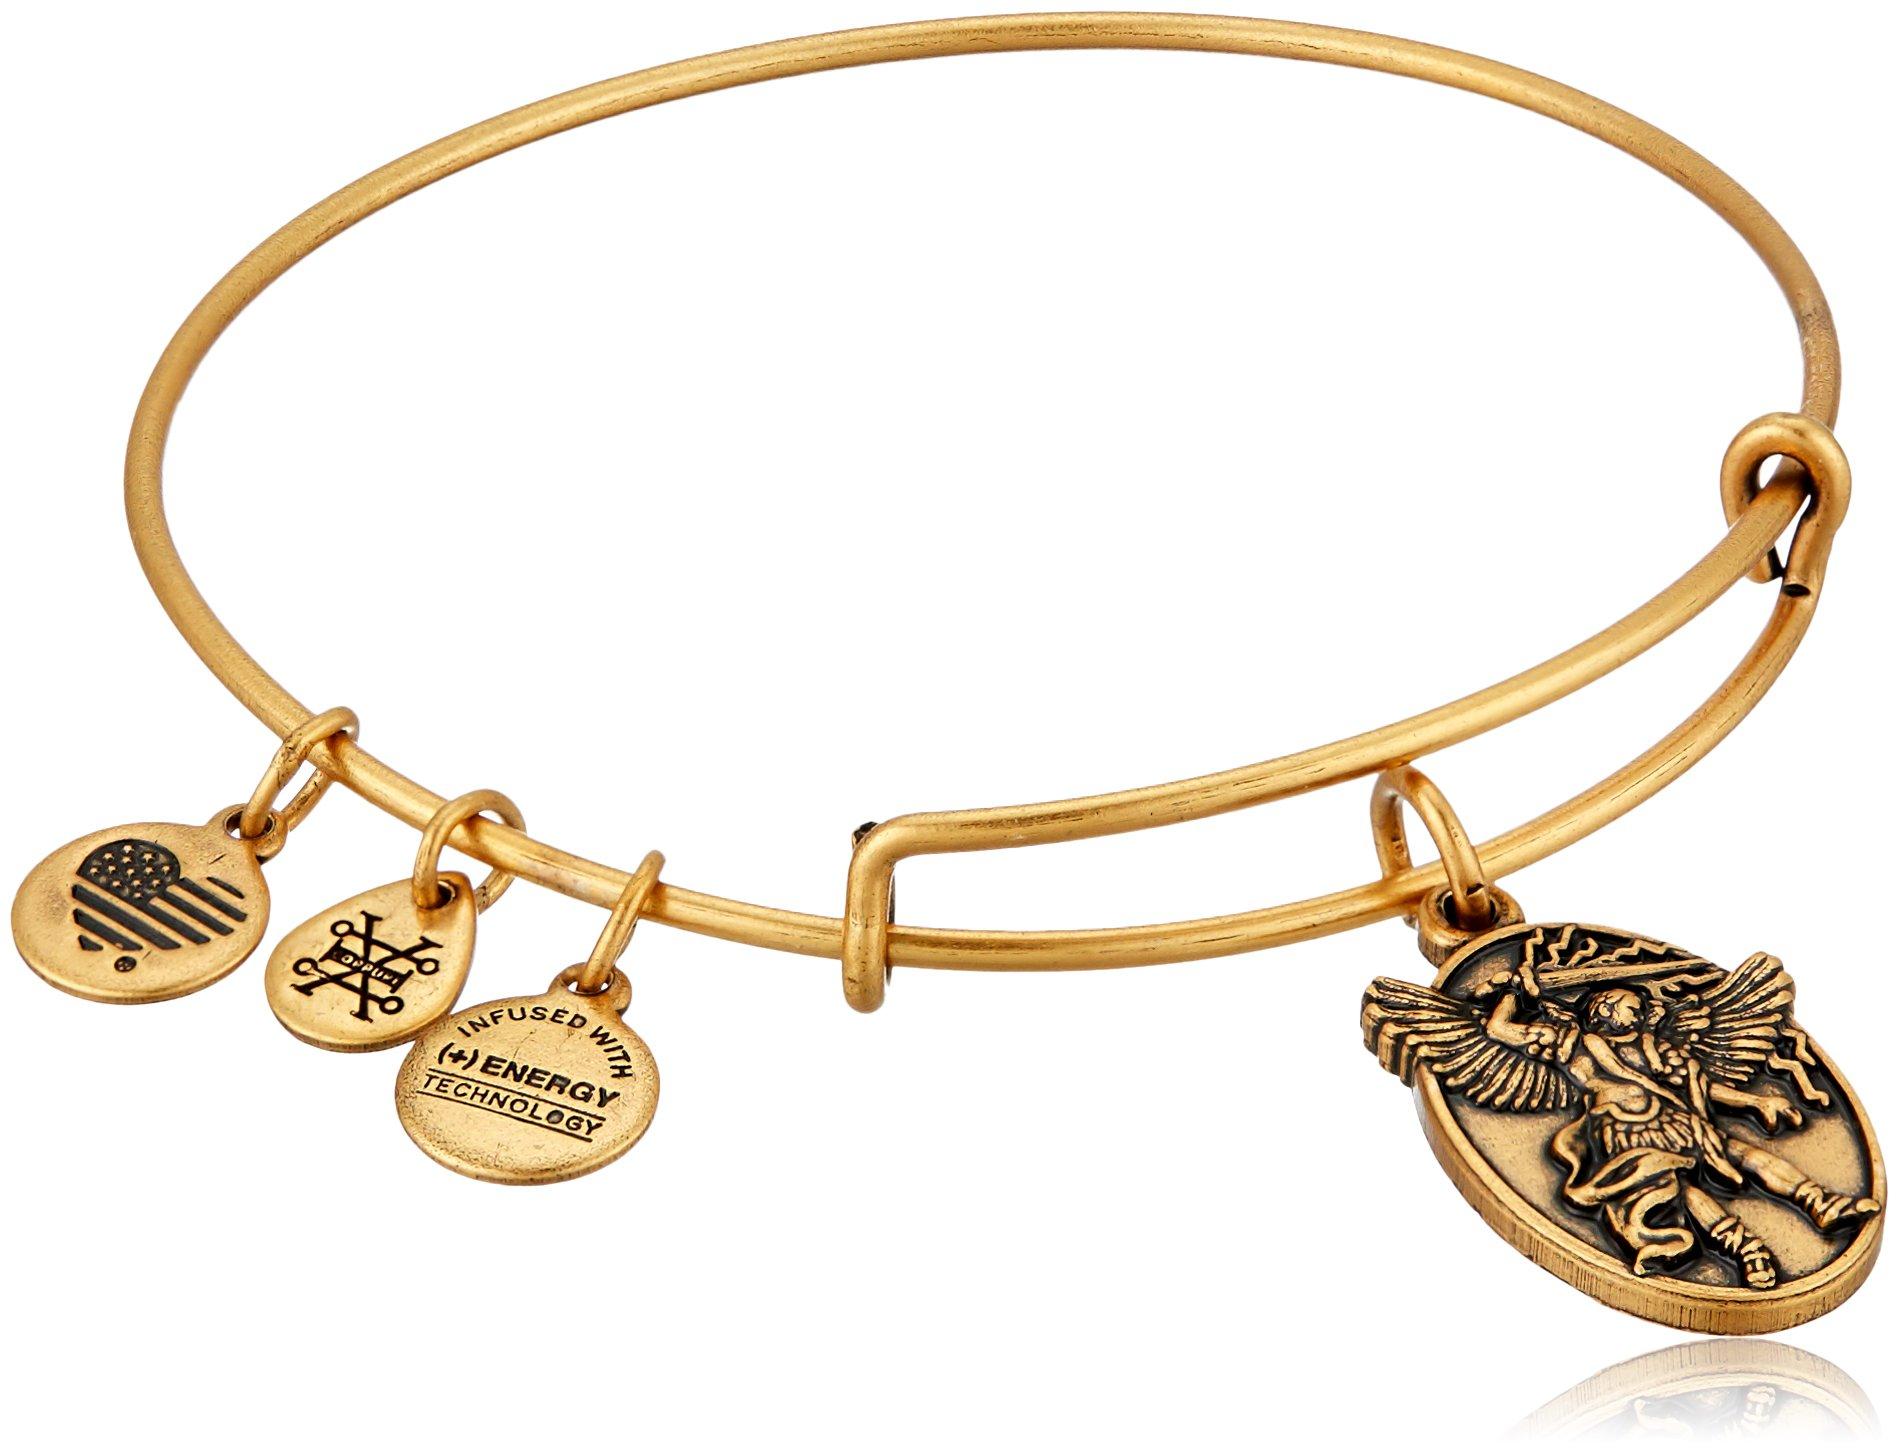 Alex and Ani Archangel Michael EWB Rafaelian Gold Bangle Bracelet